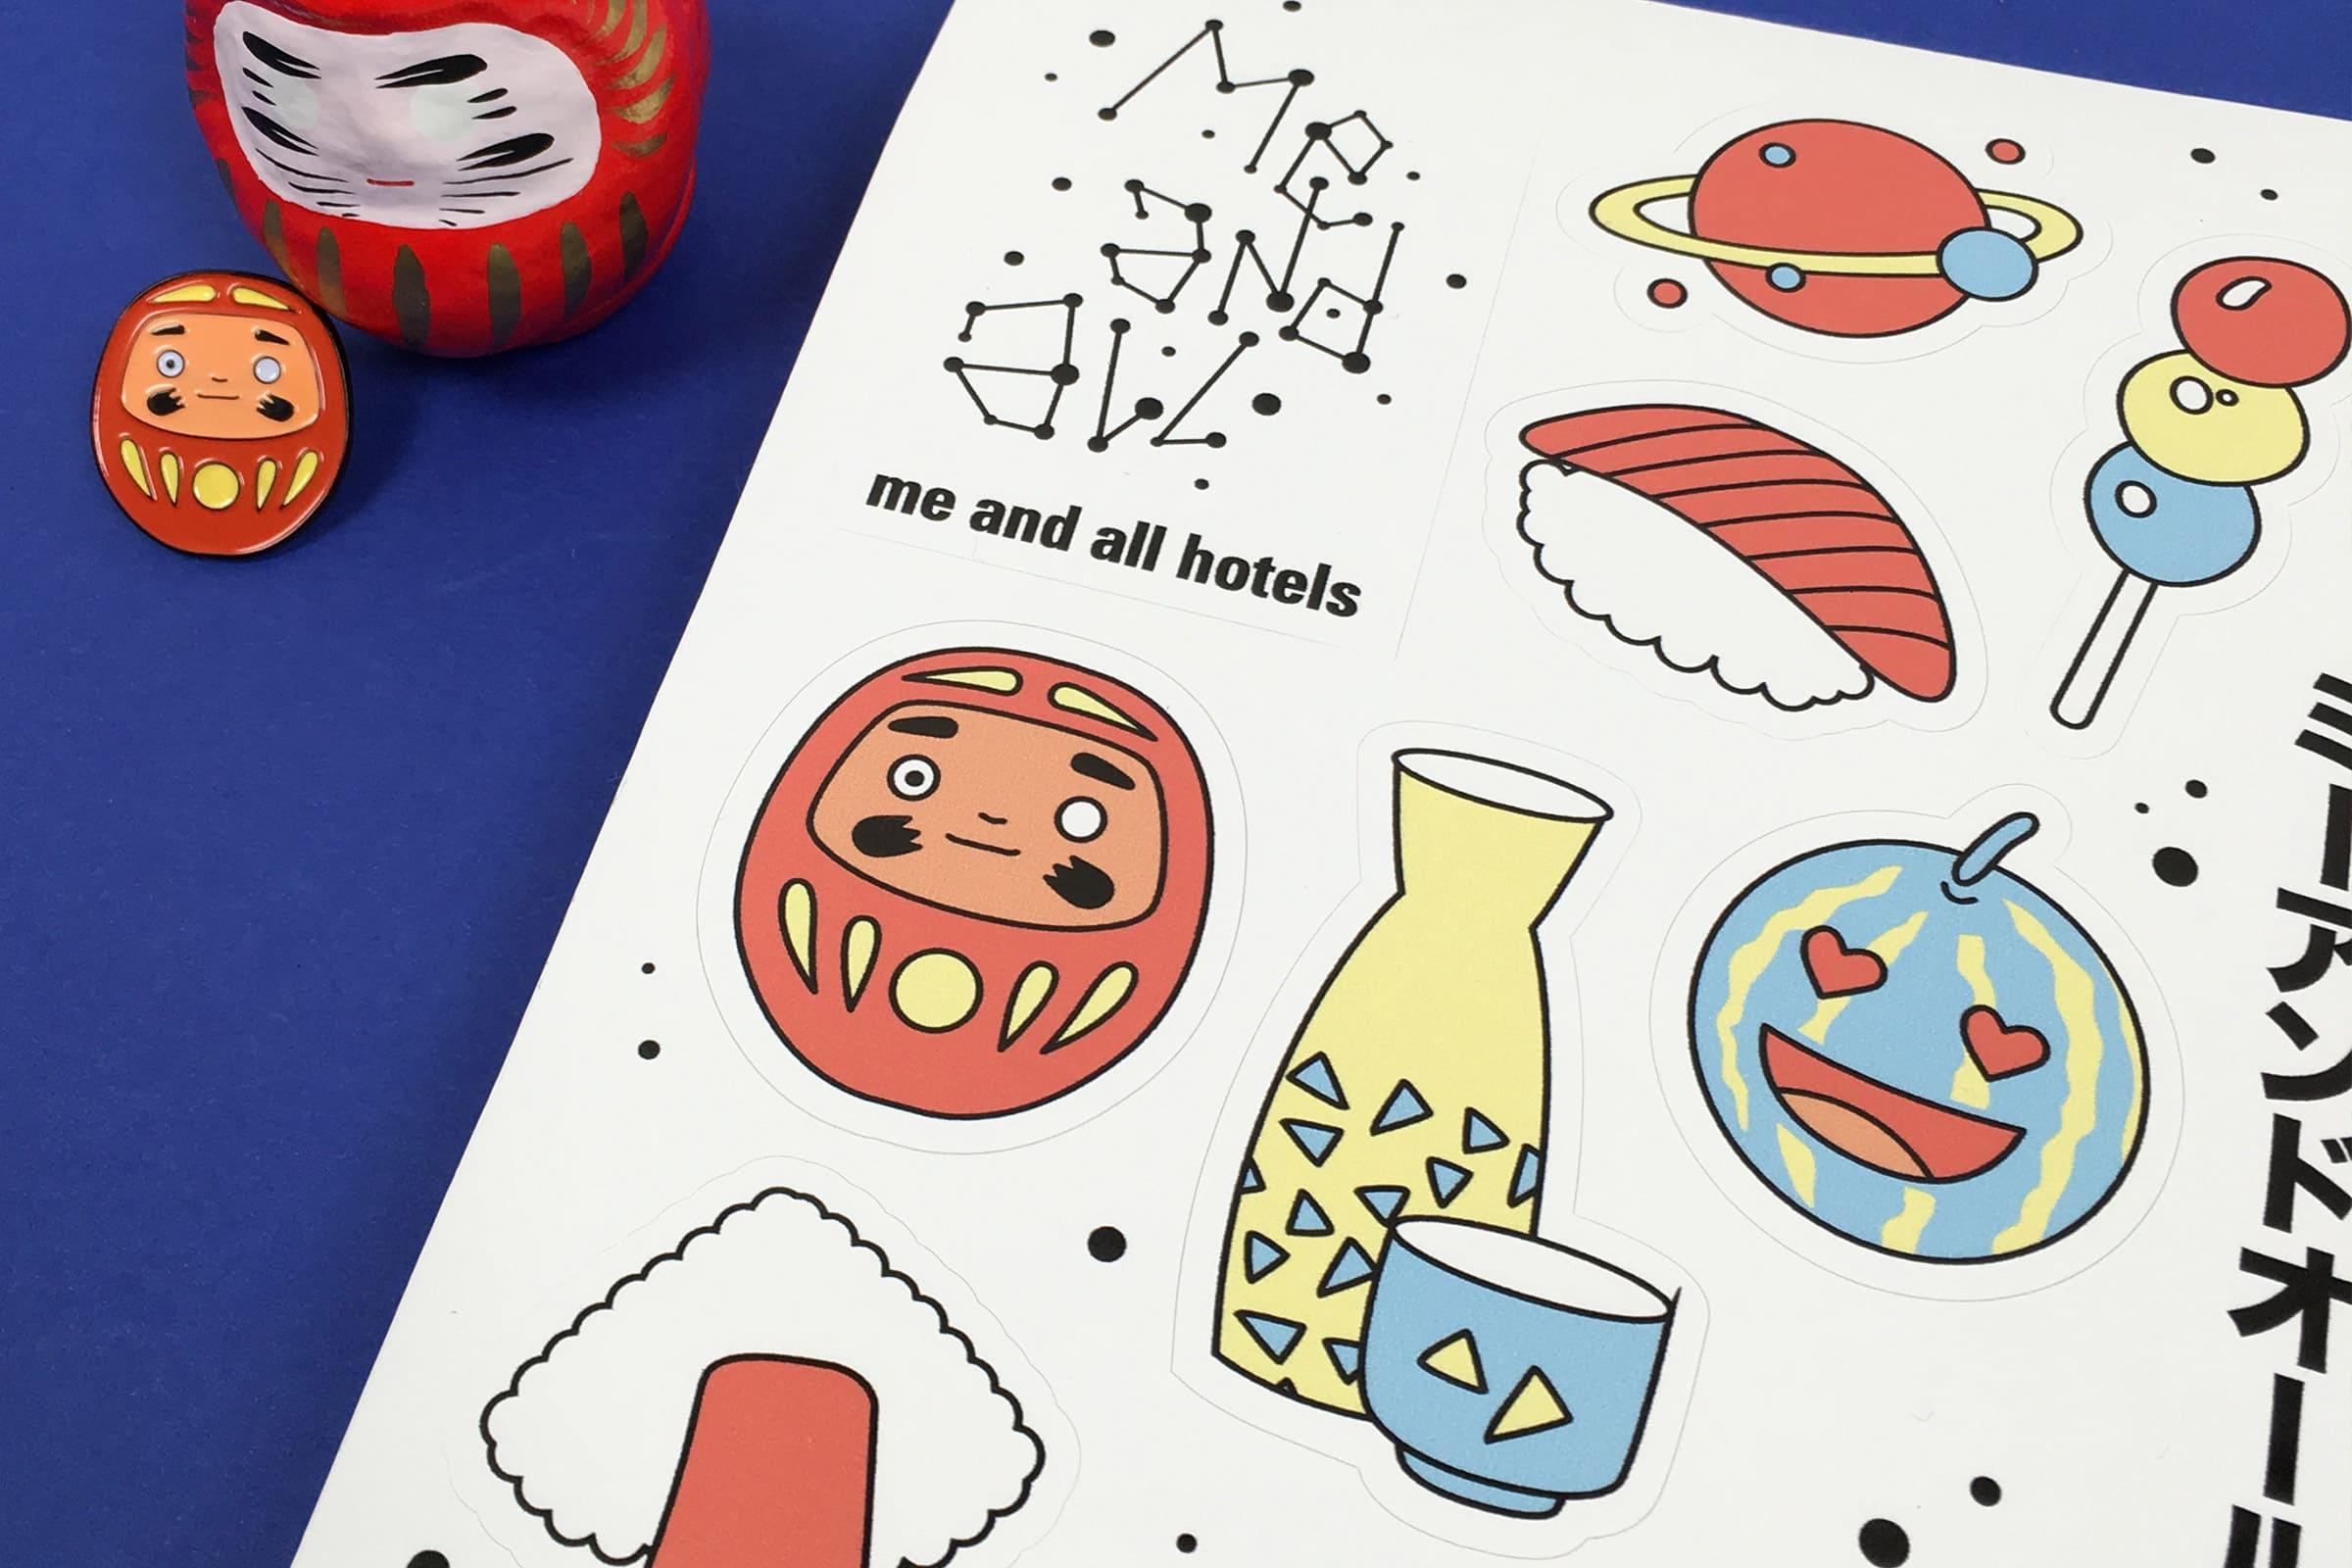 Japantag, Sticker Sheet, Daruma, me and all hotel, Düsseldorf, Merchandise, Design, Illustration